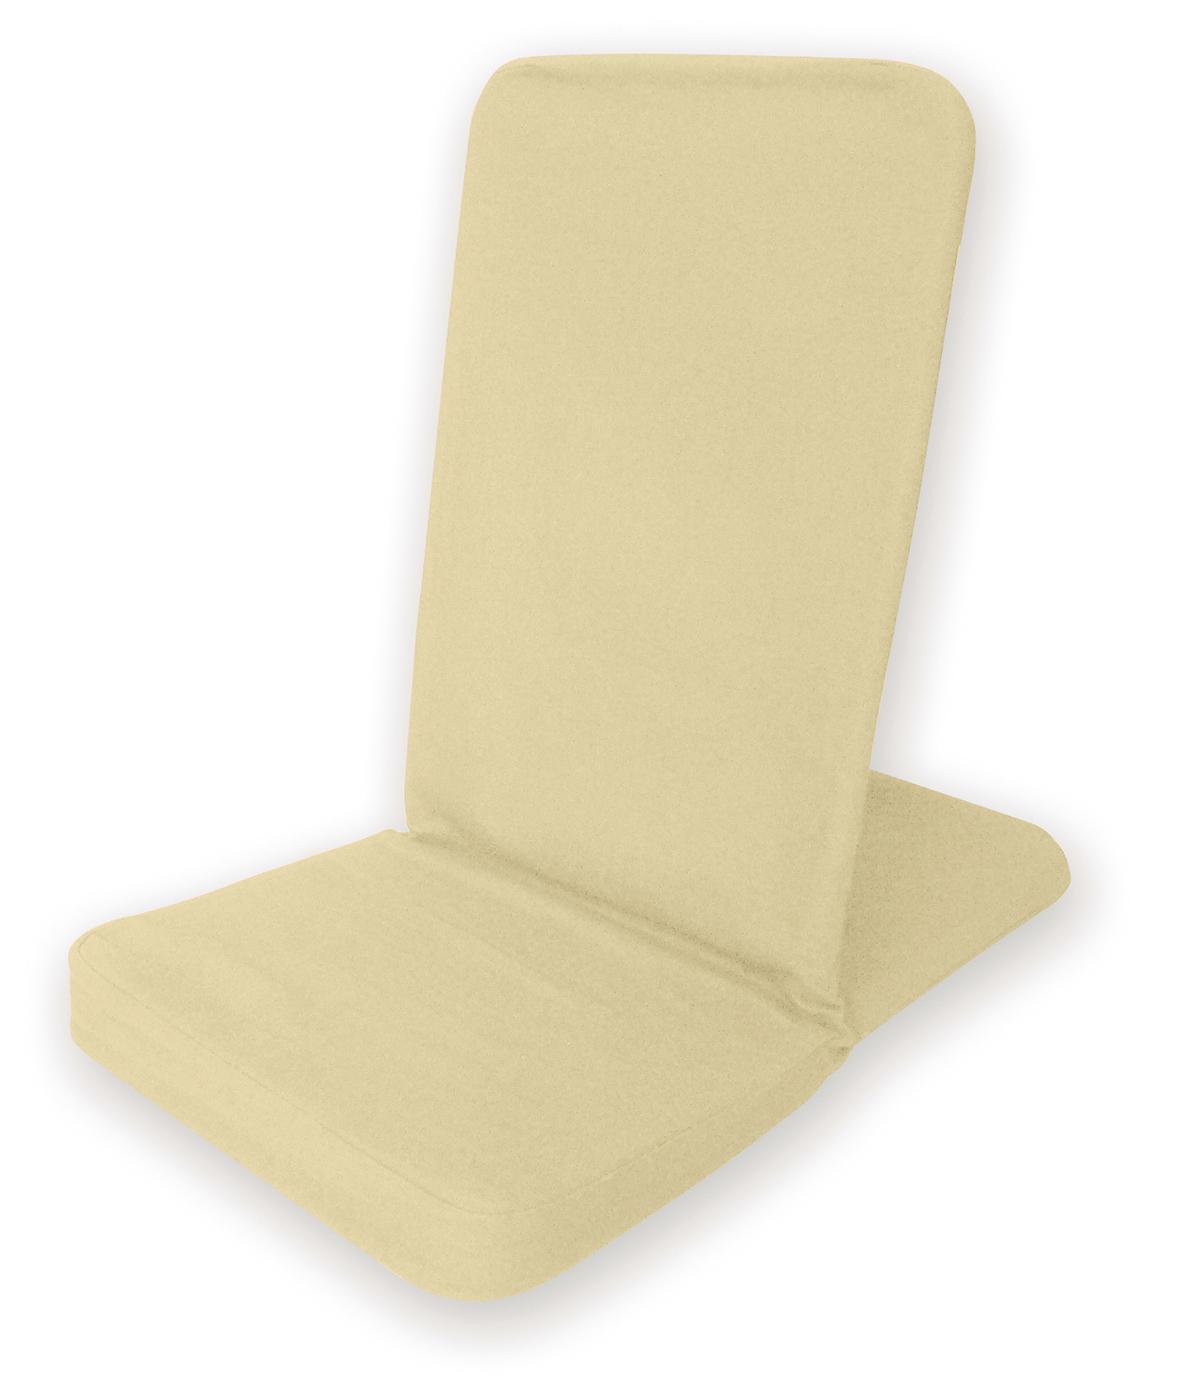 Bodenstuhl faltbar - Folding Backjack